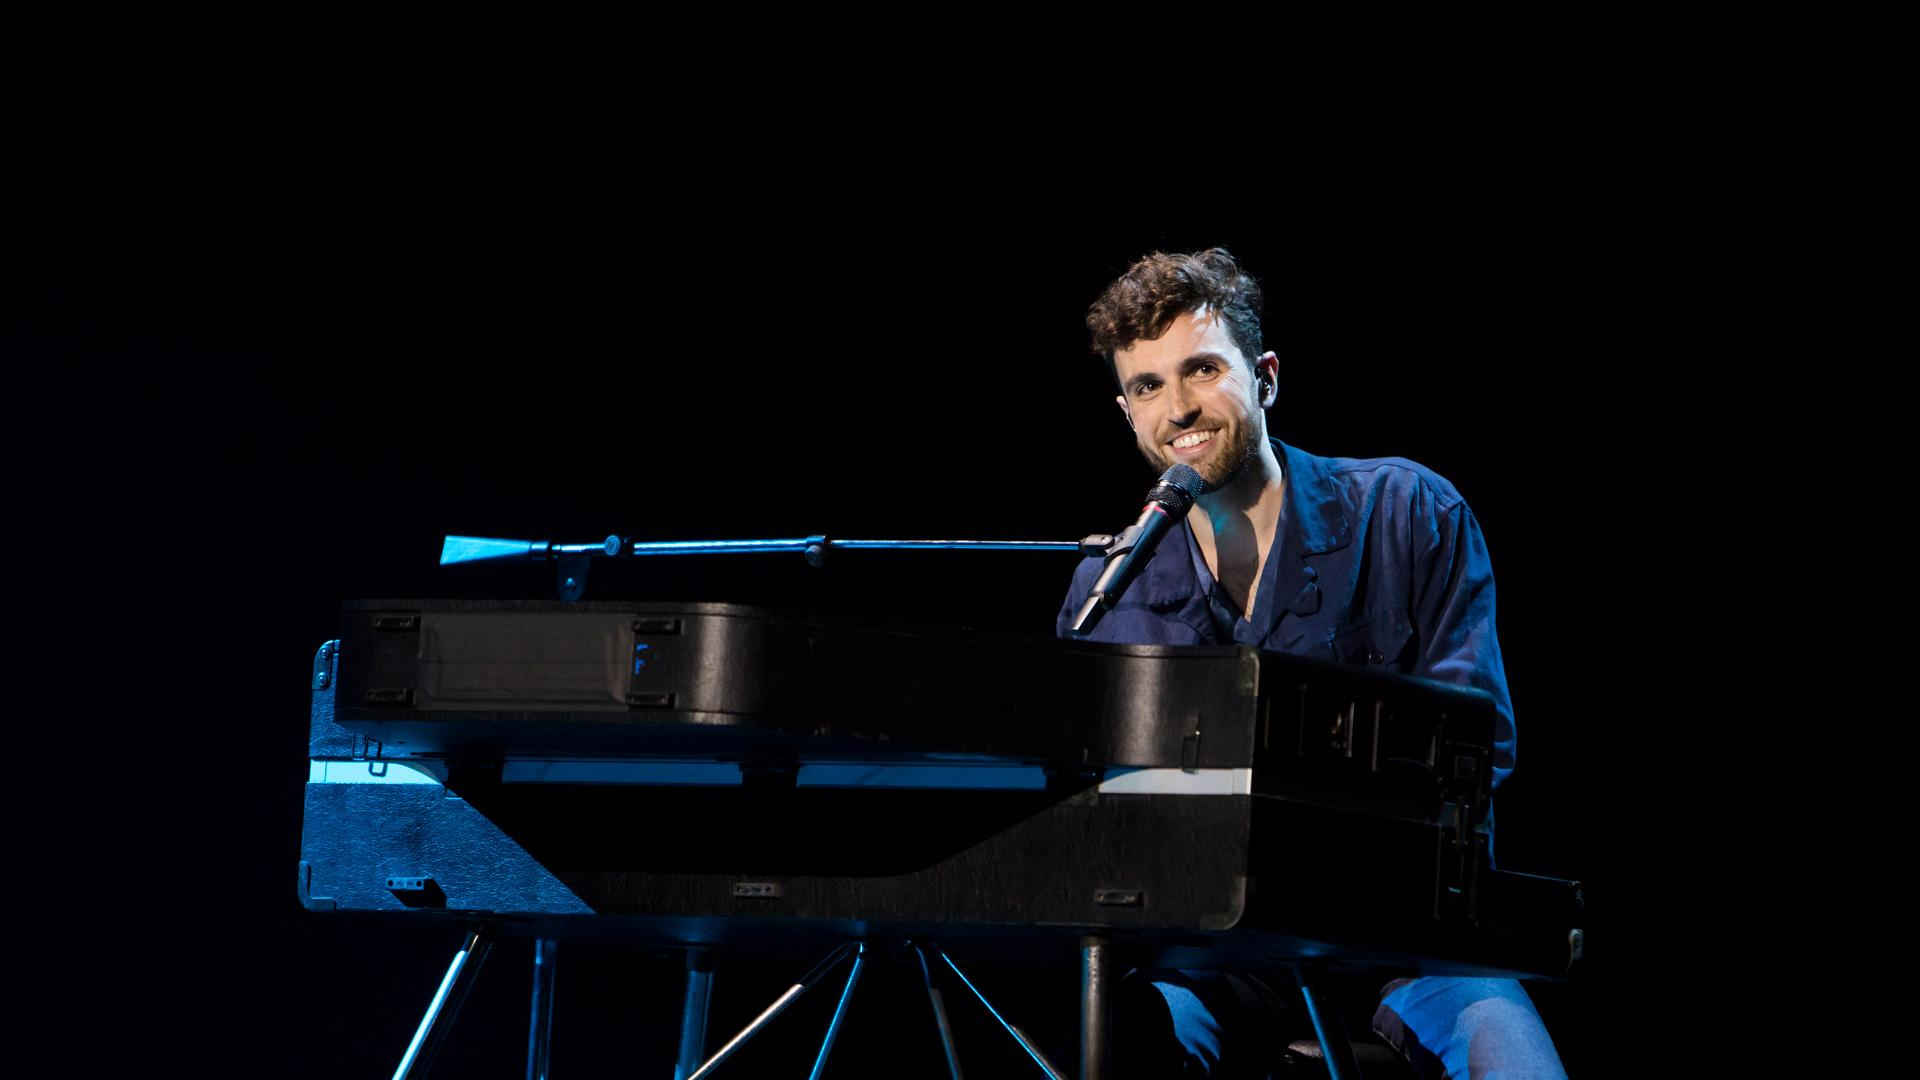 Duncan Laurence toegevoegd aan line up online Eurovision Village